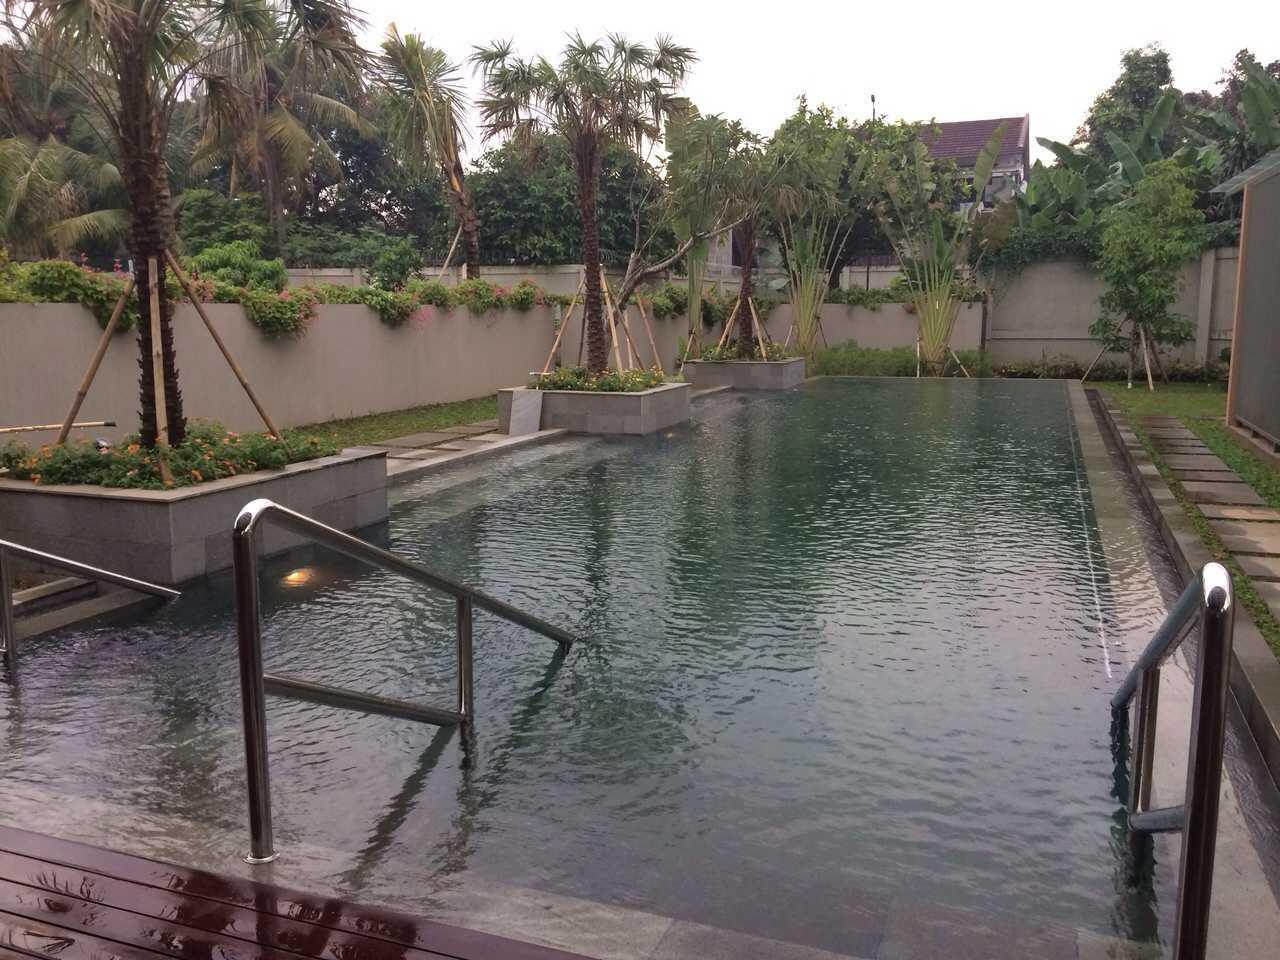 Pt. Garisprada Lebak Bulus Residence Lebak Bulus, Cilandak, South Jakarta City, Jakarta, Indonesia Lebak Bulus Swimming Pool Tropis  21871